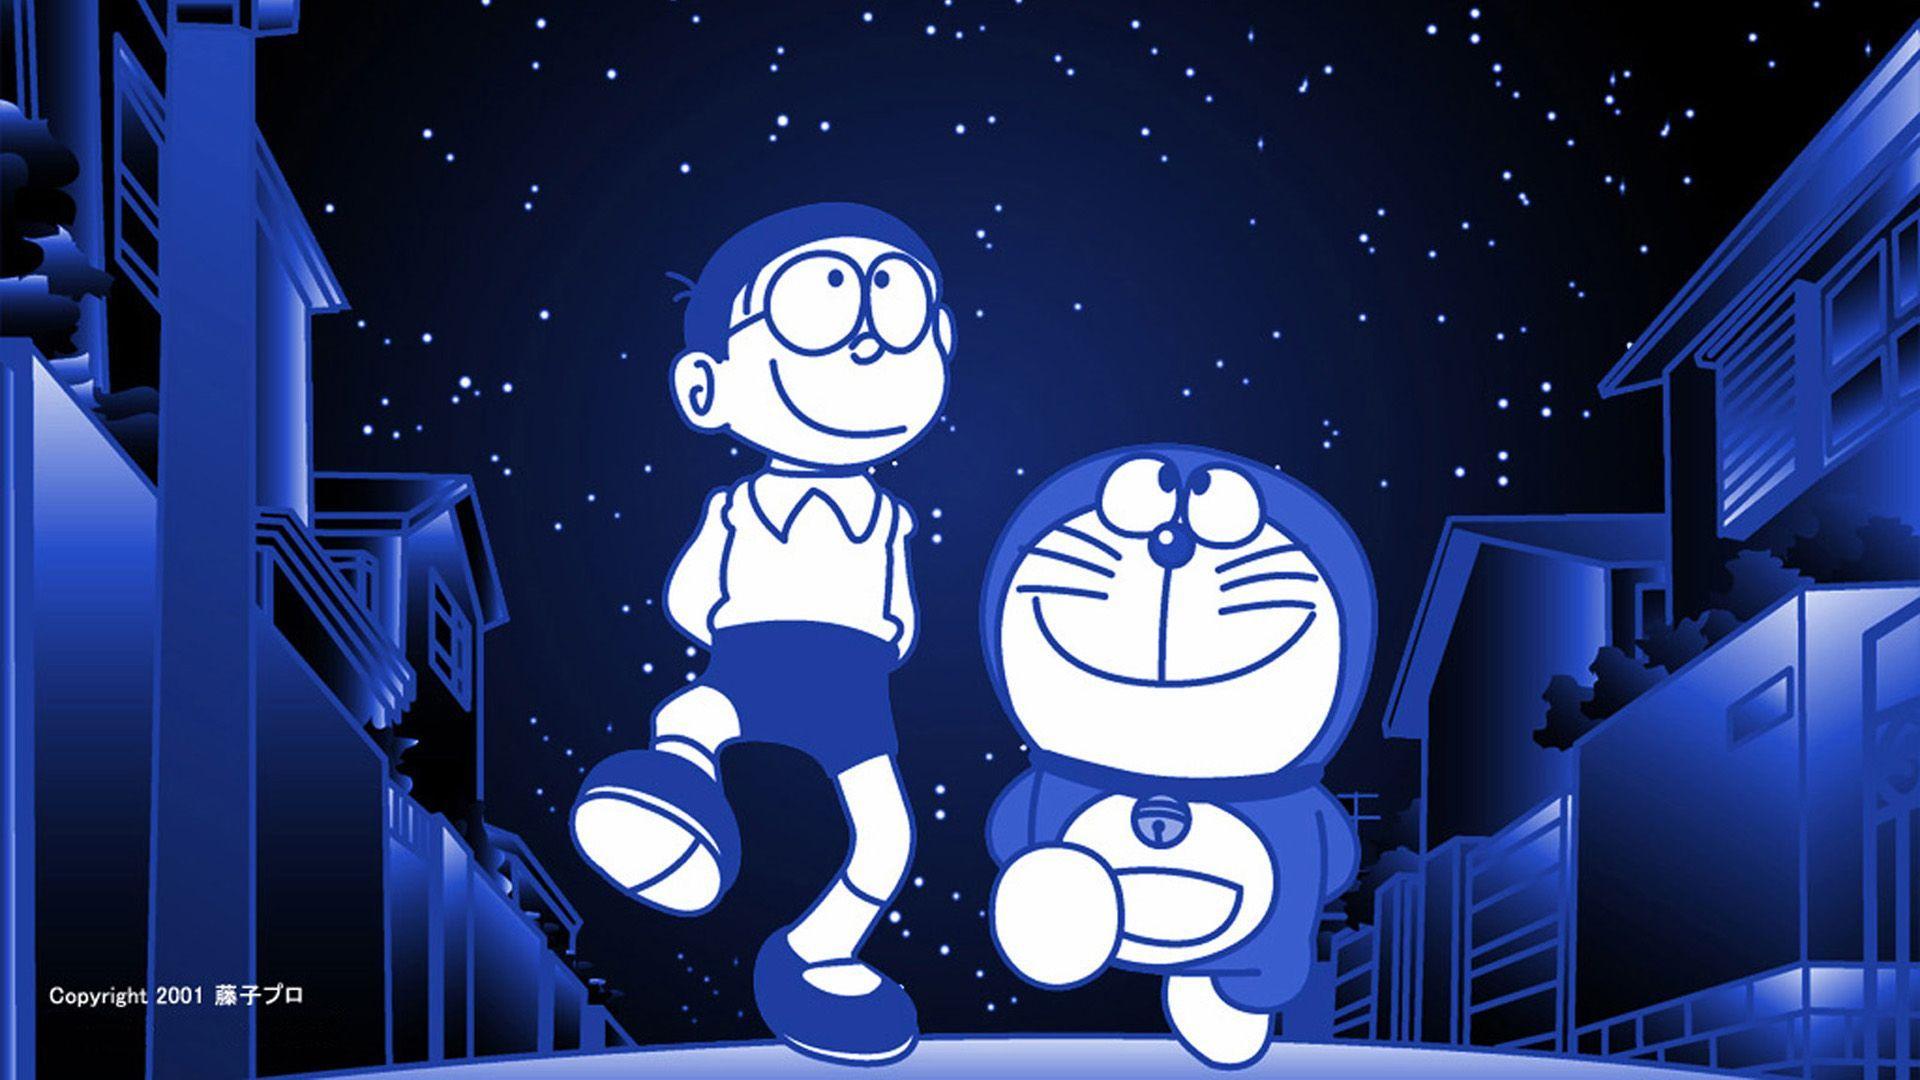 Doraemon Wallpapers Hd Wallpaper Cave